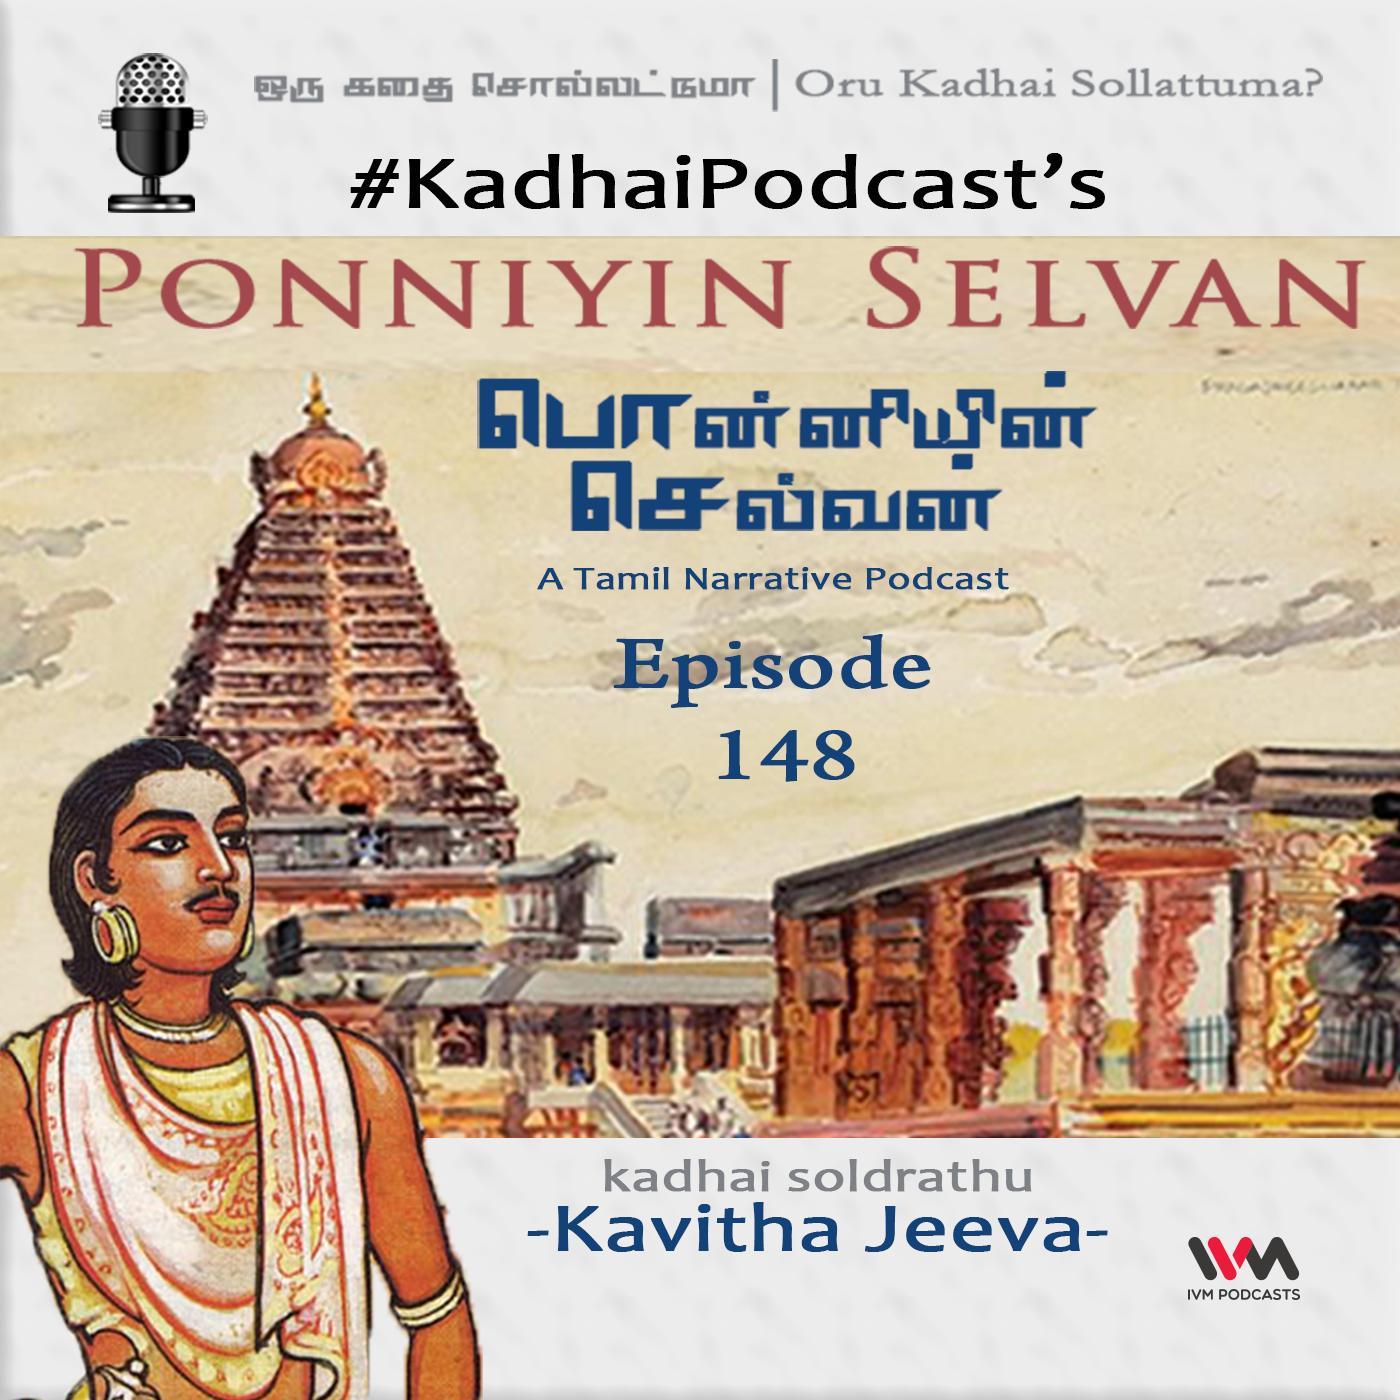 KadhaiPodcast's Ponniyin Selvan - Episode # 148